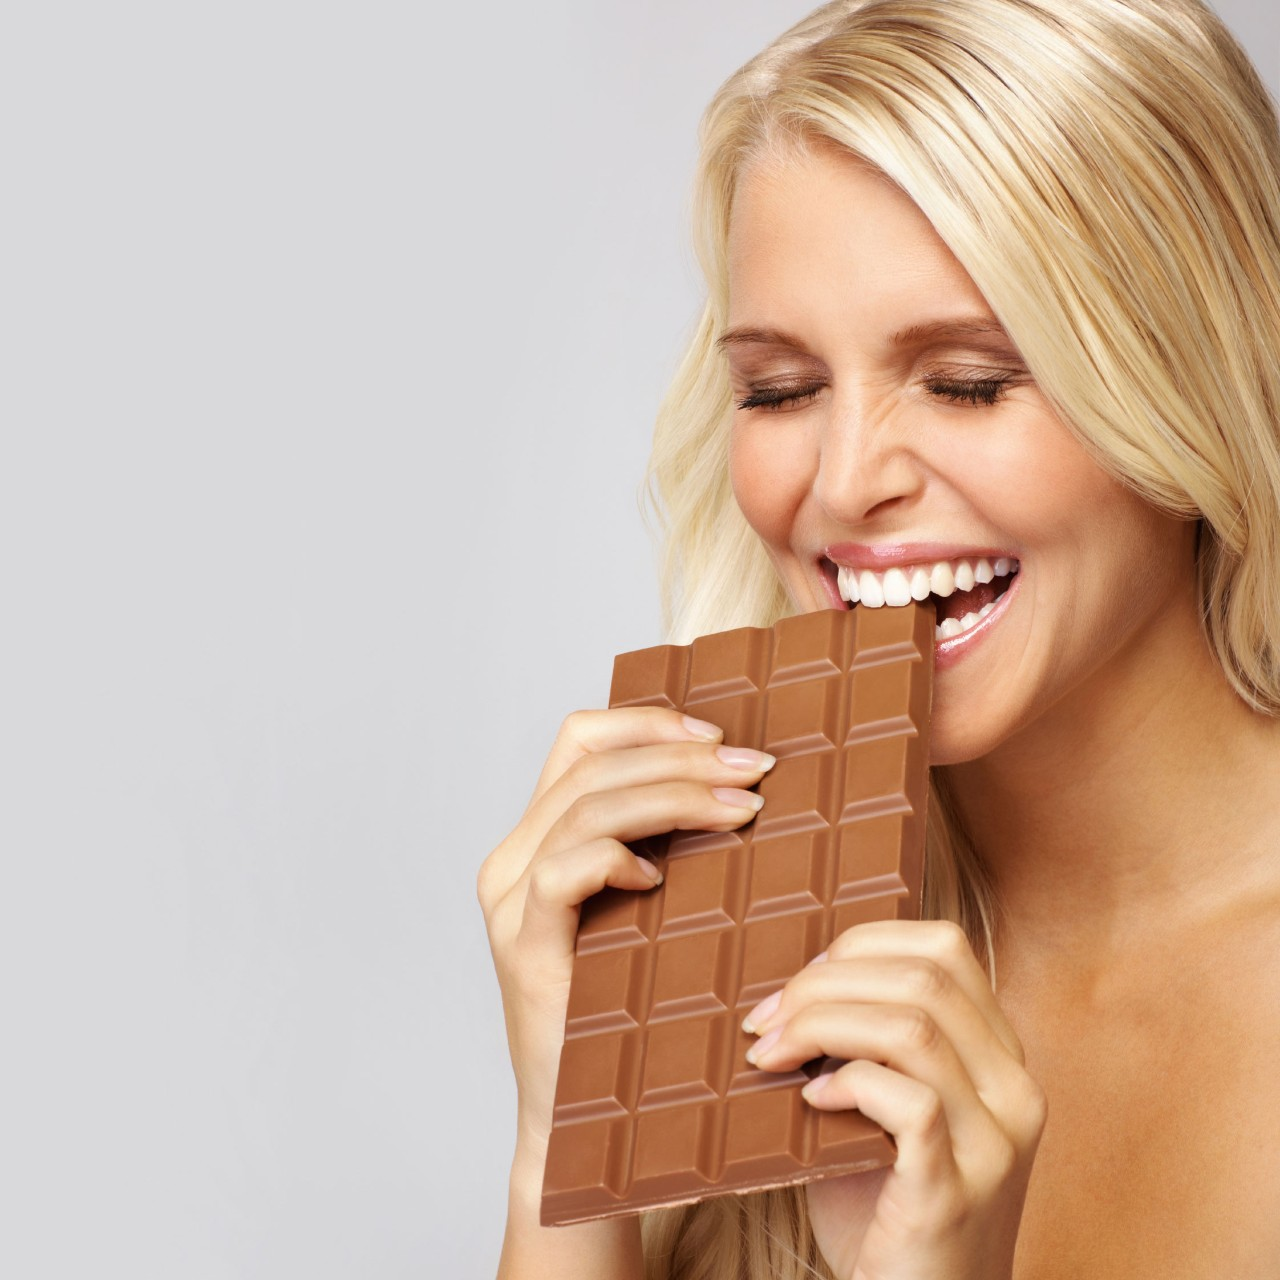 7. Chocolate